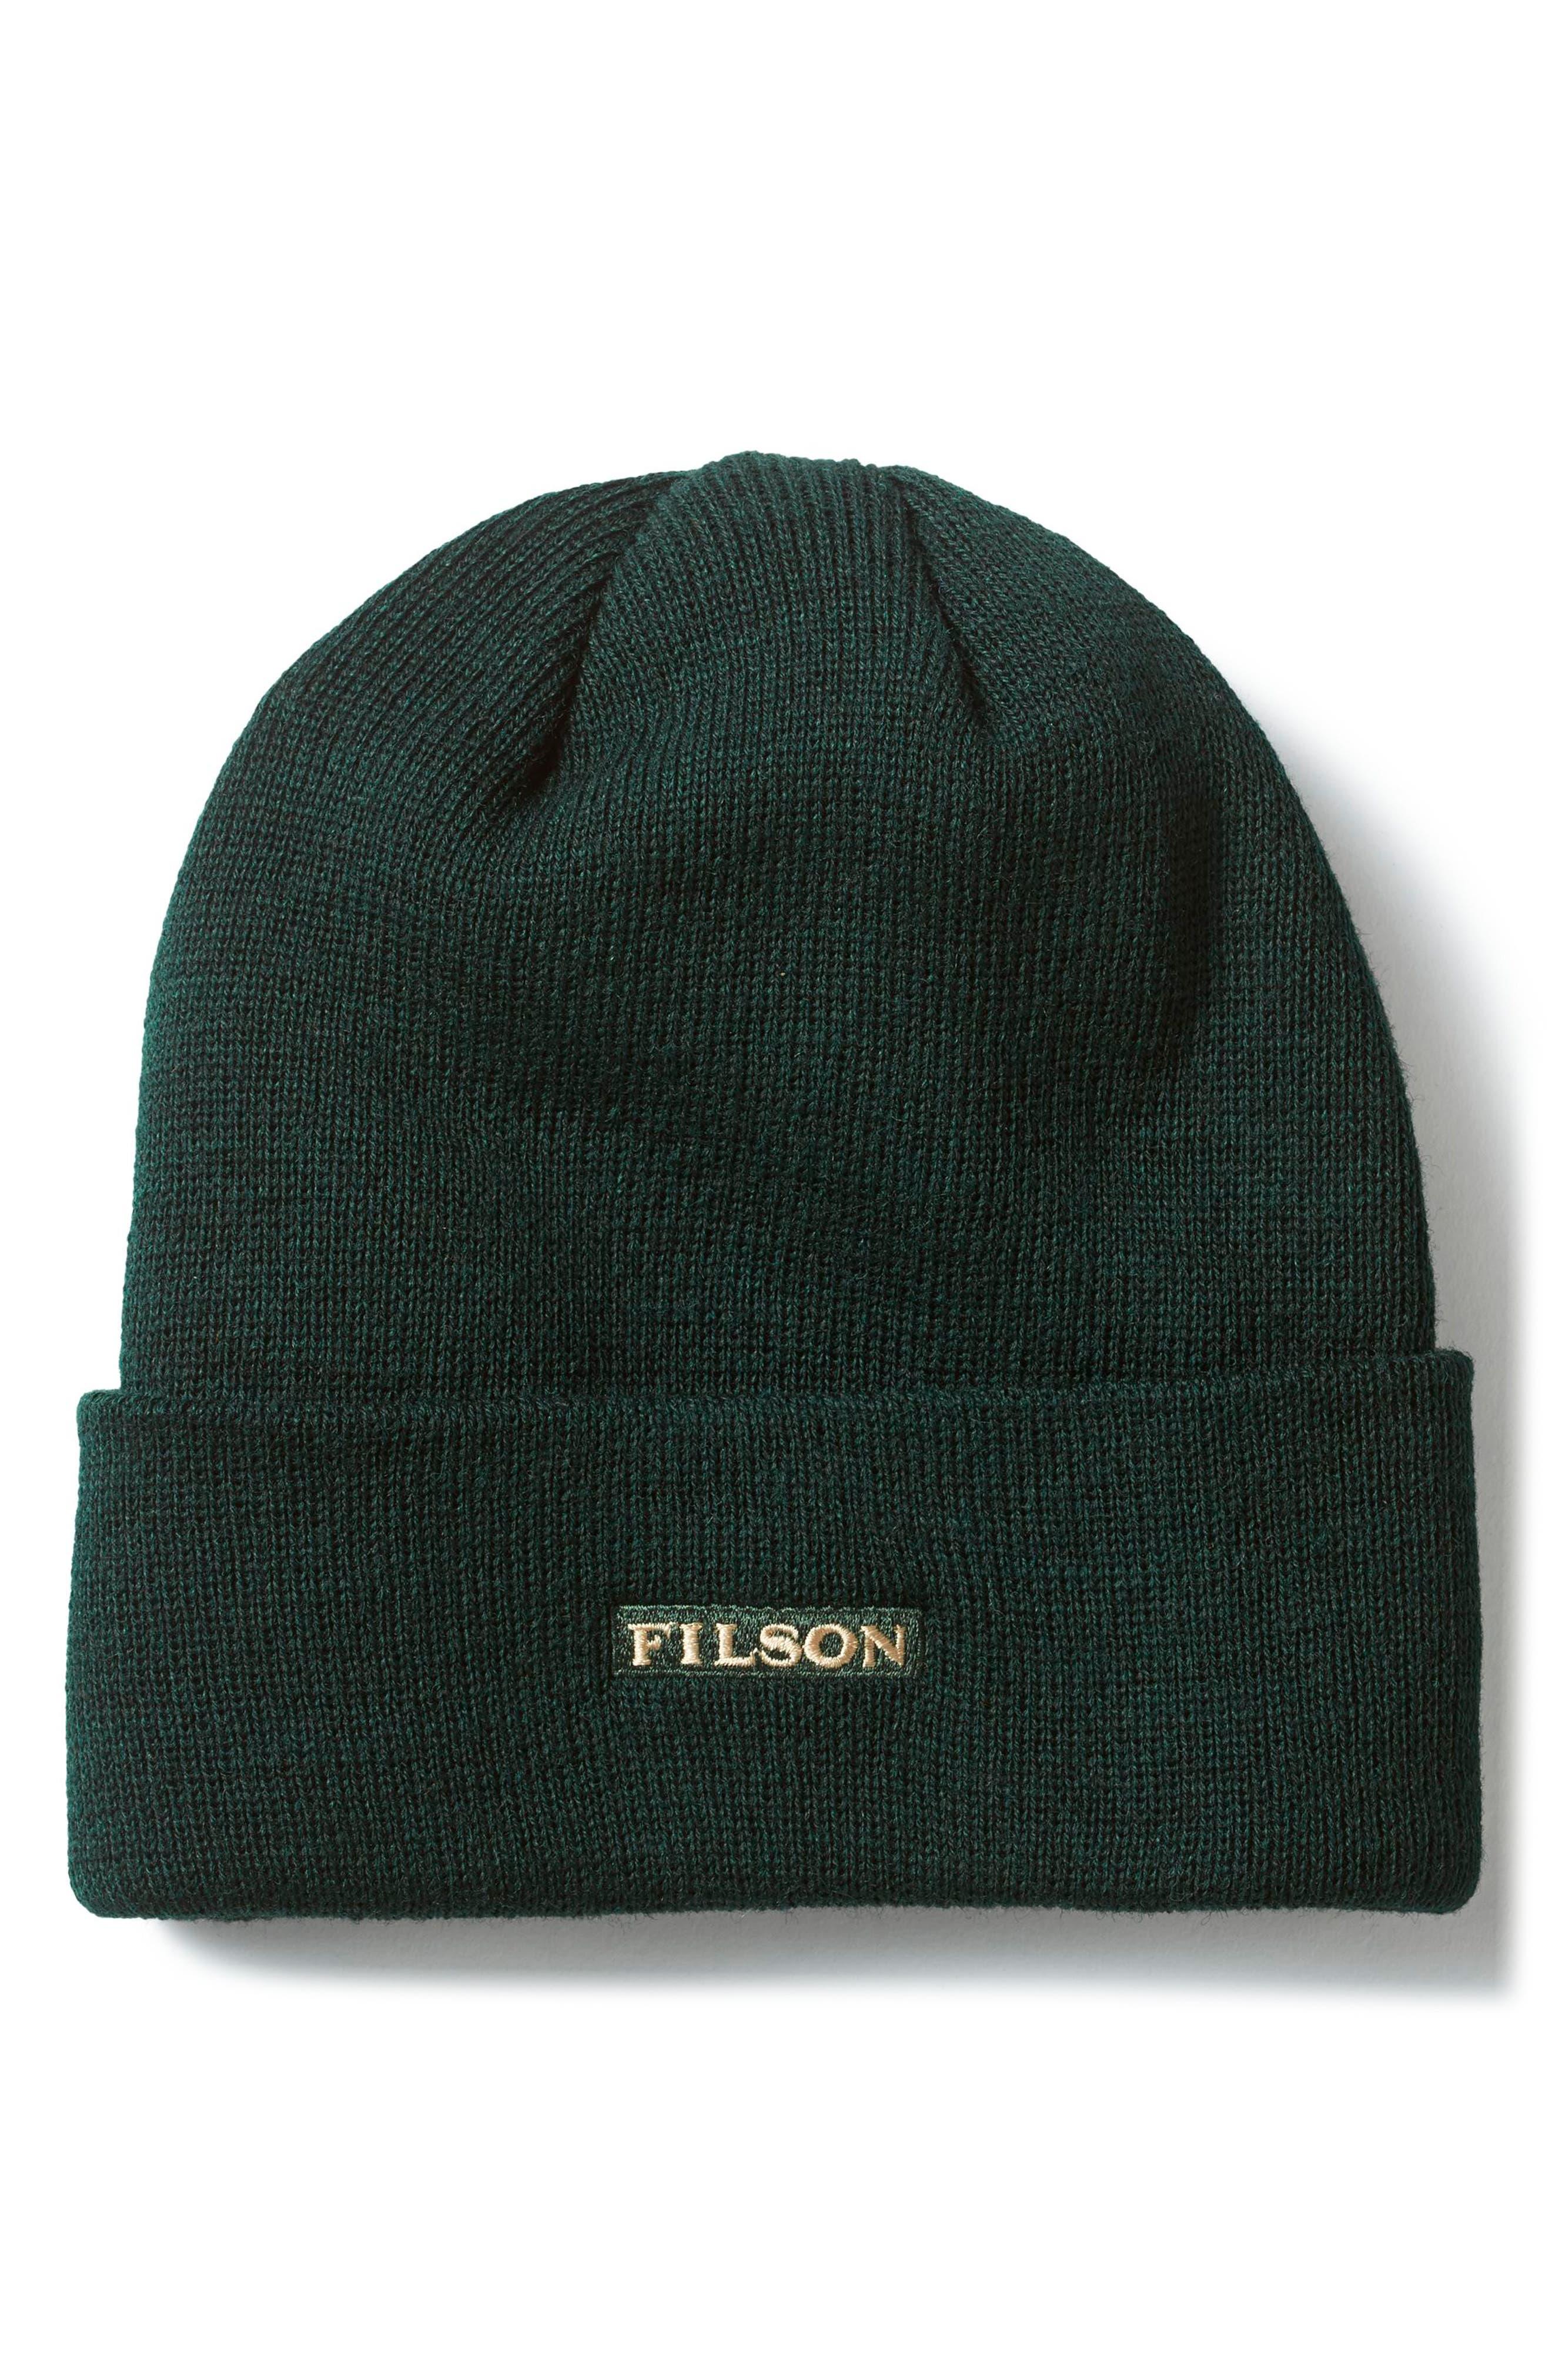 Wool Cap,                             Main thumbnail 1, color,                             Green